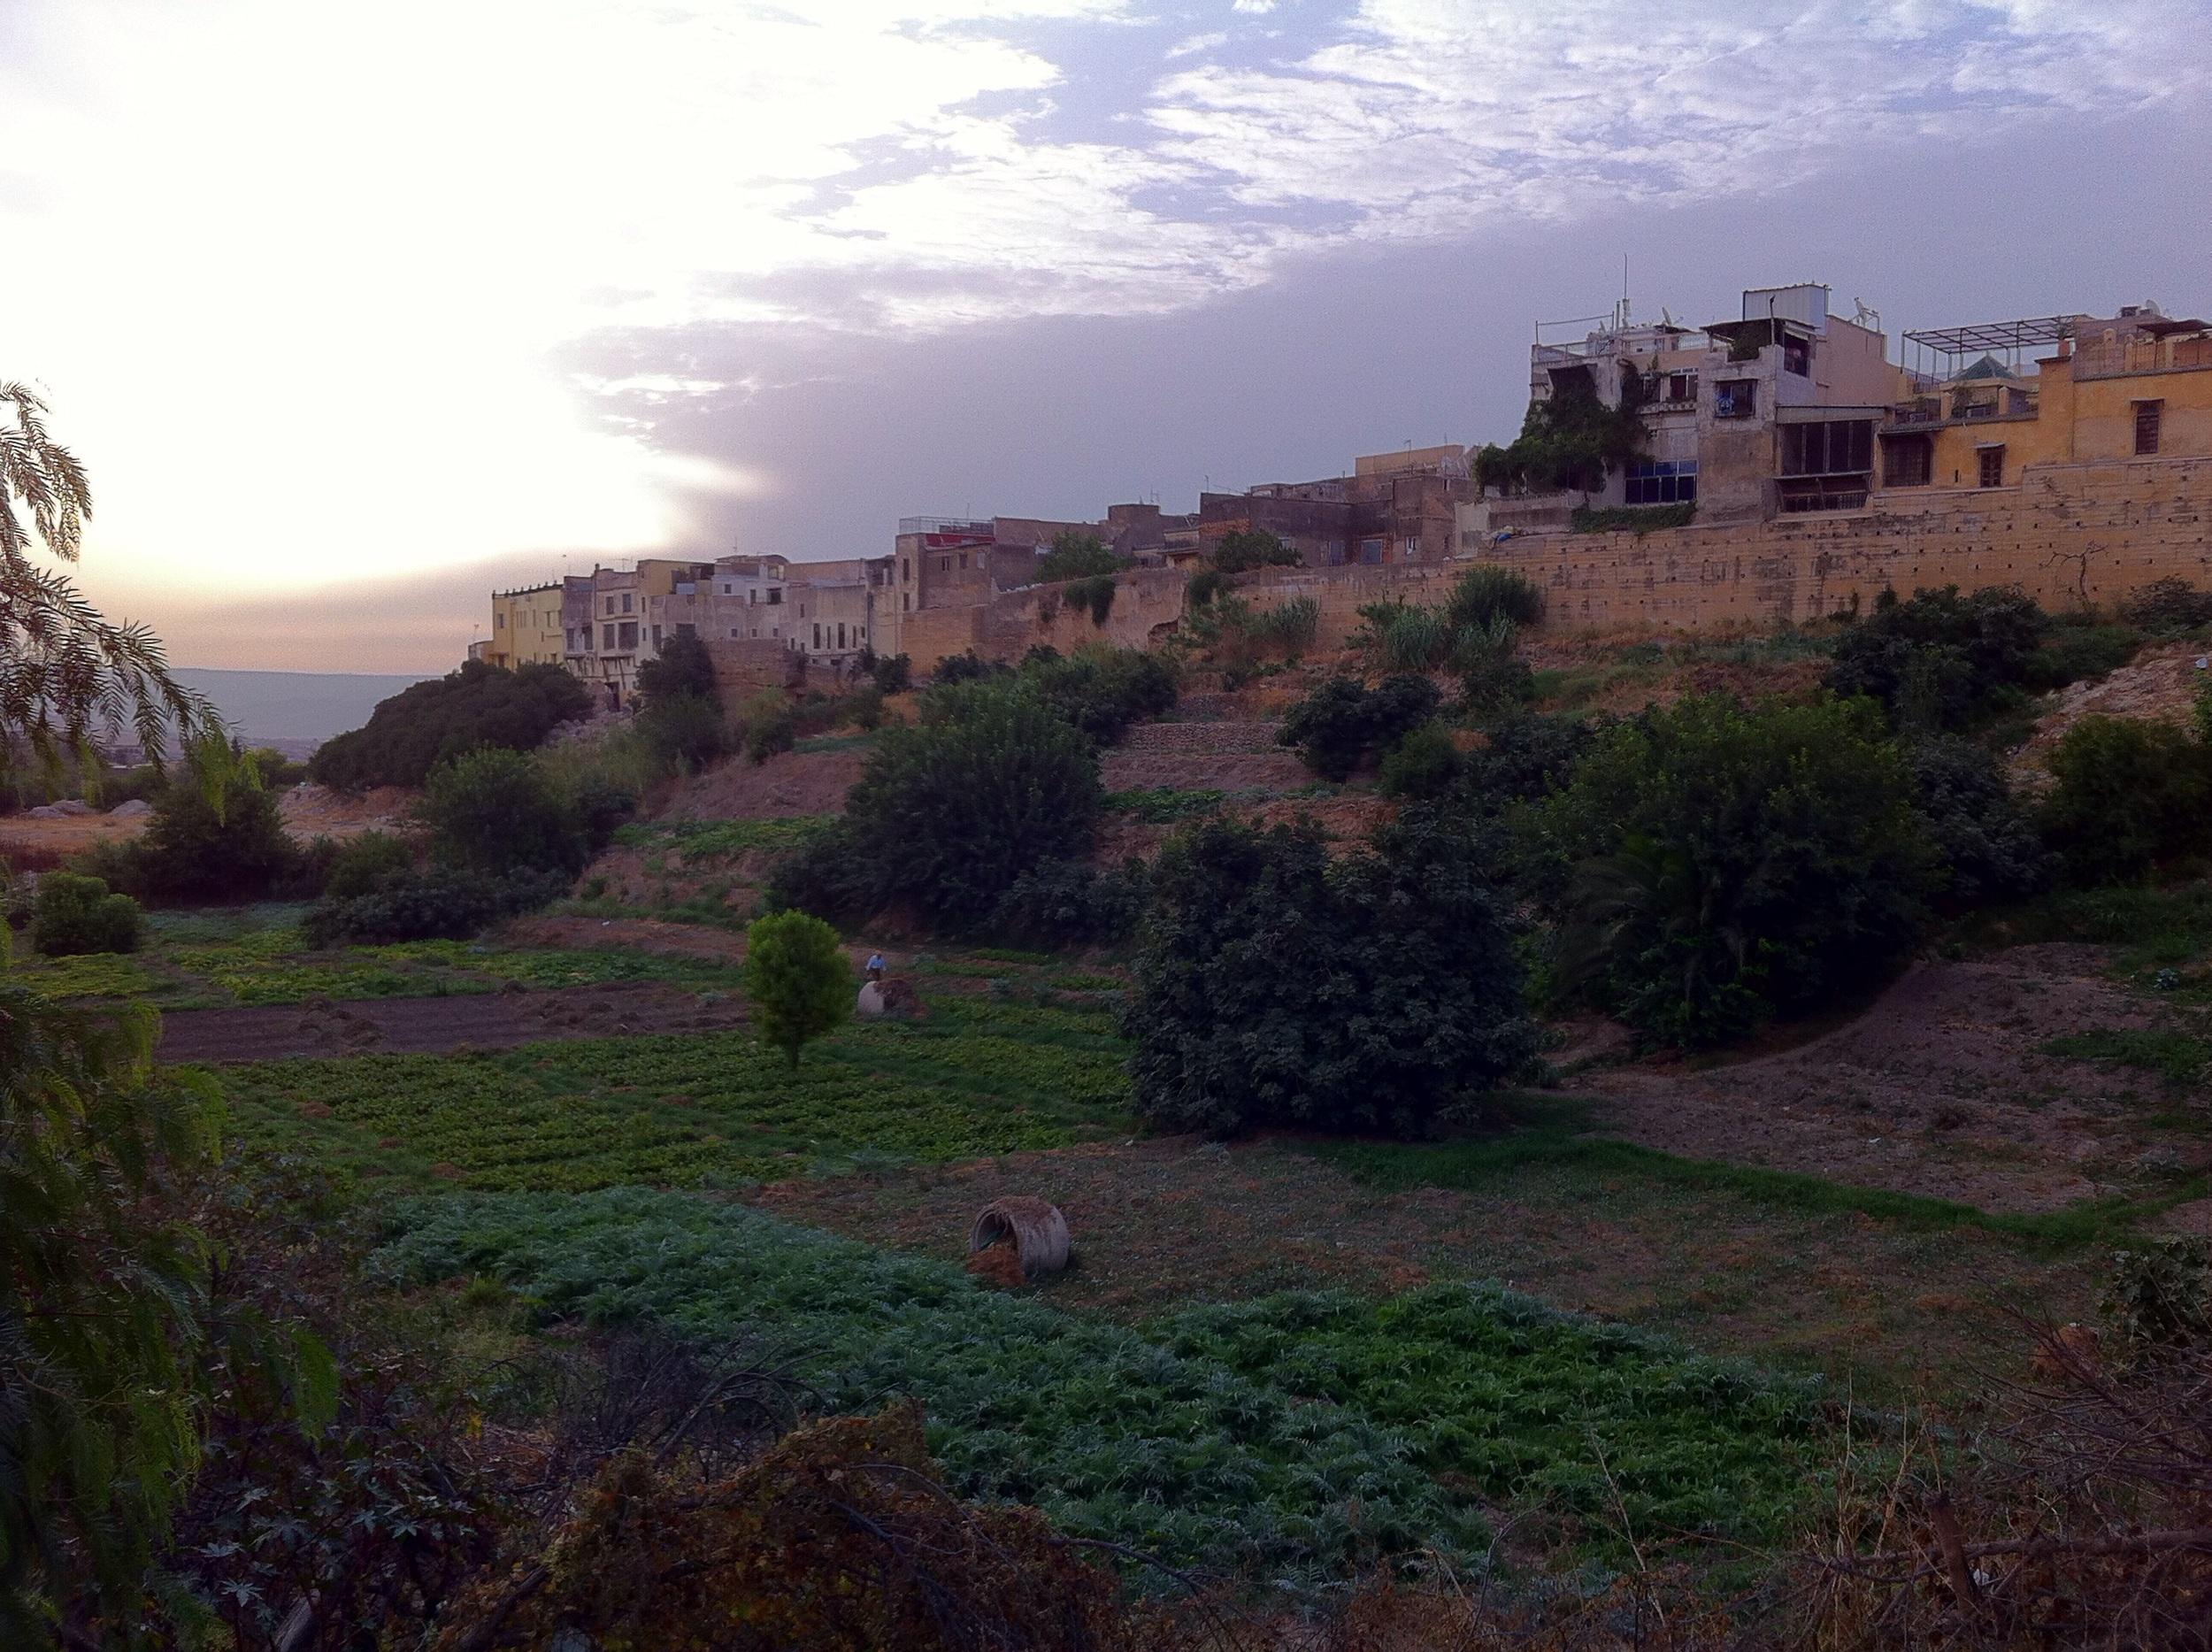 A small farm next to the Fes medina